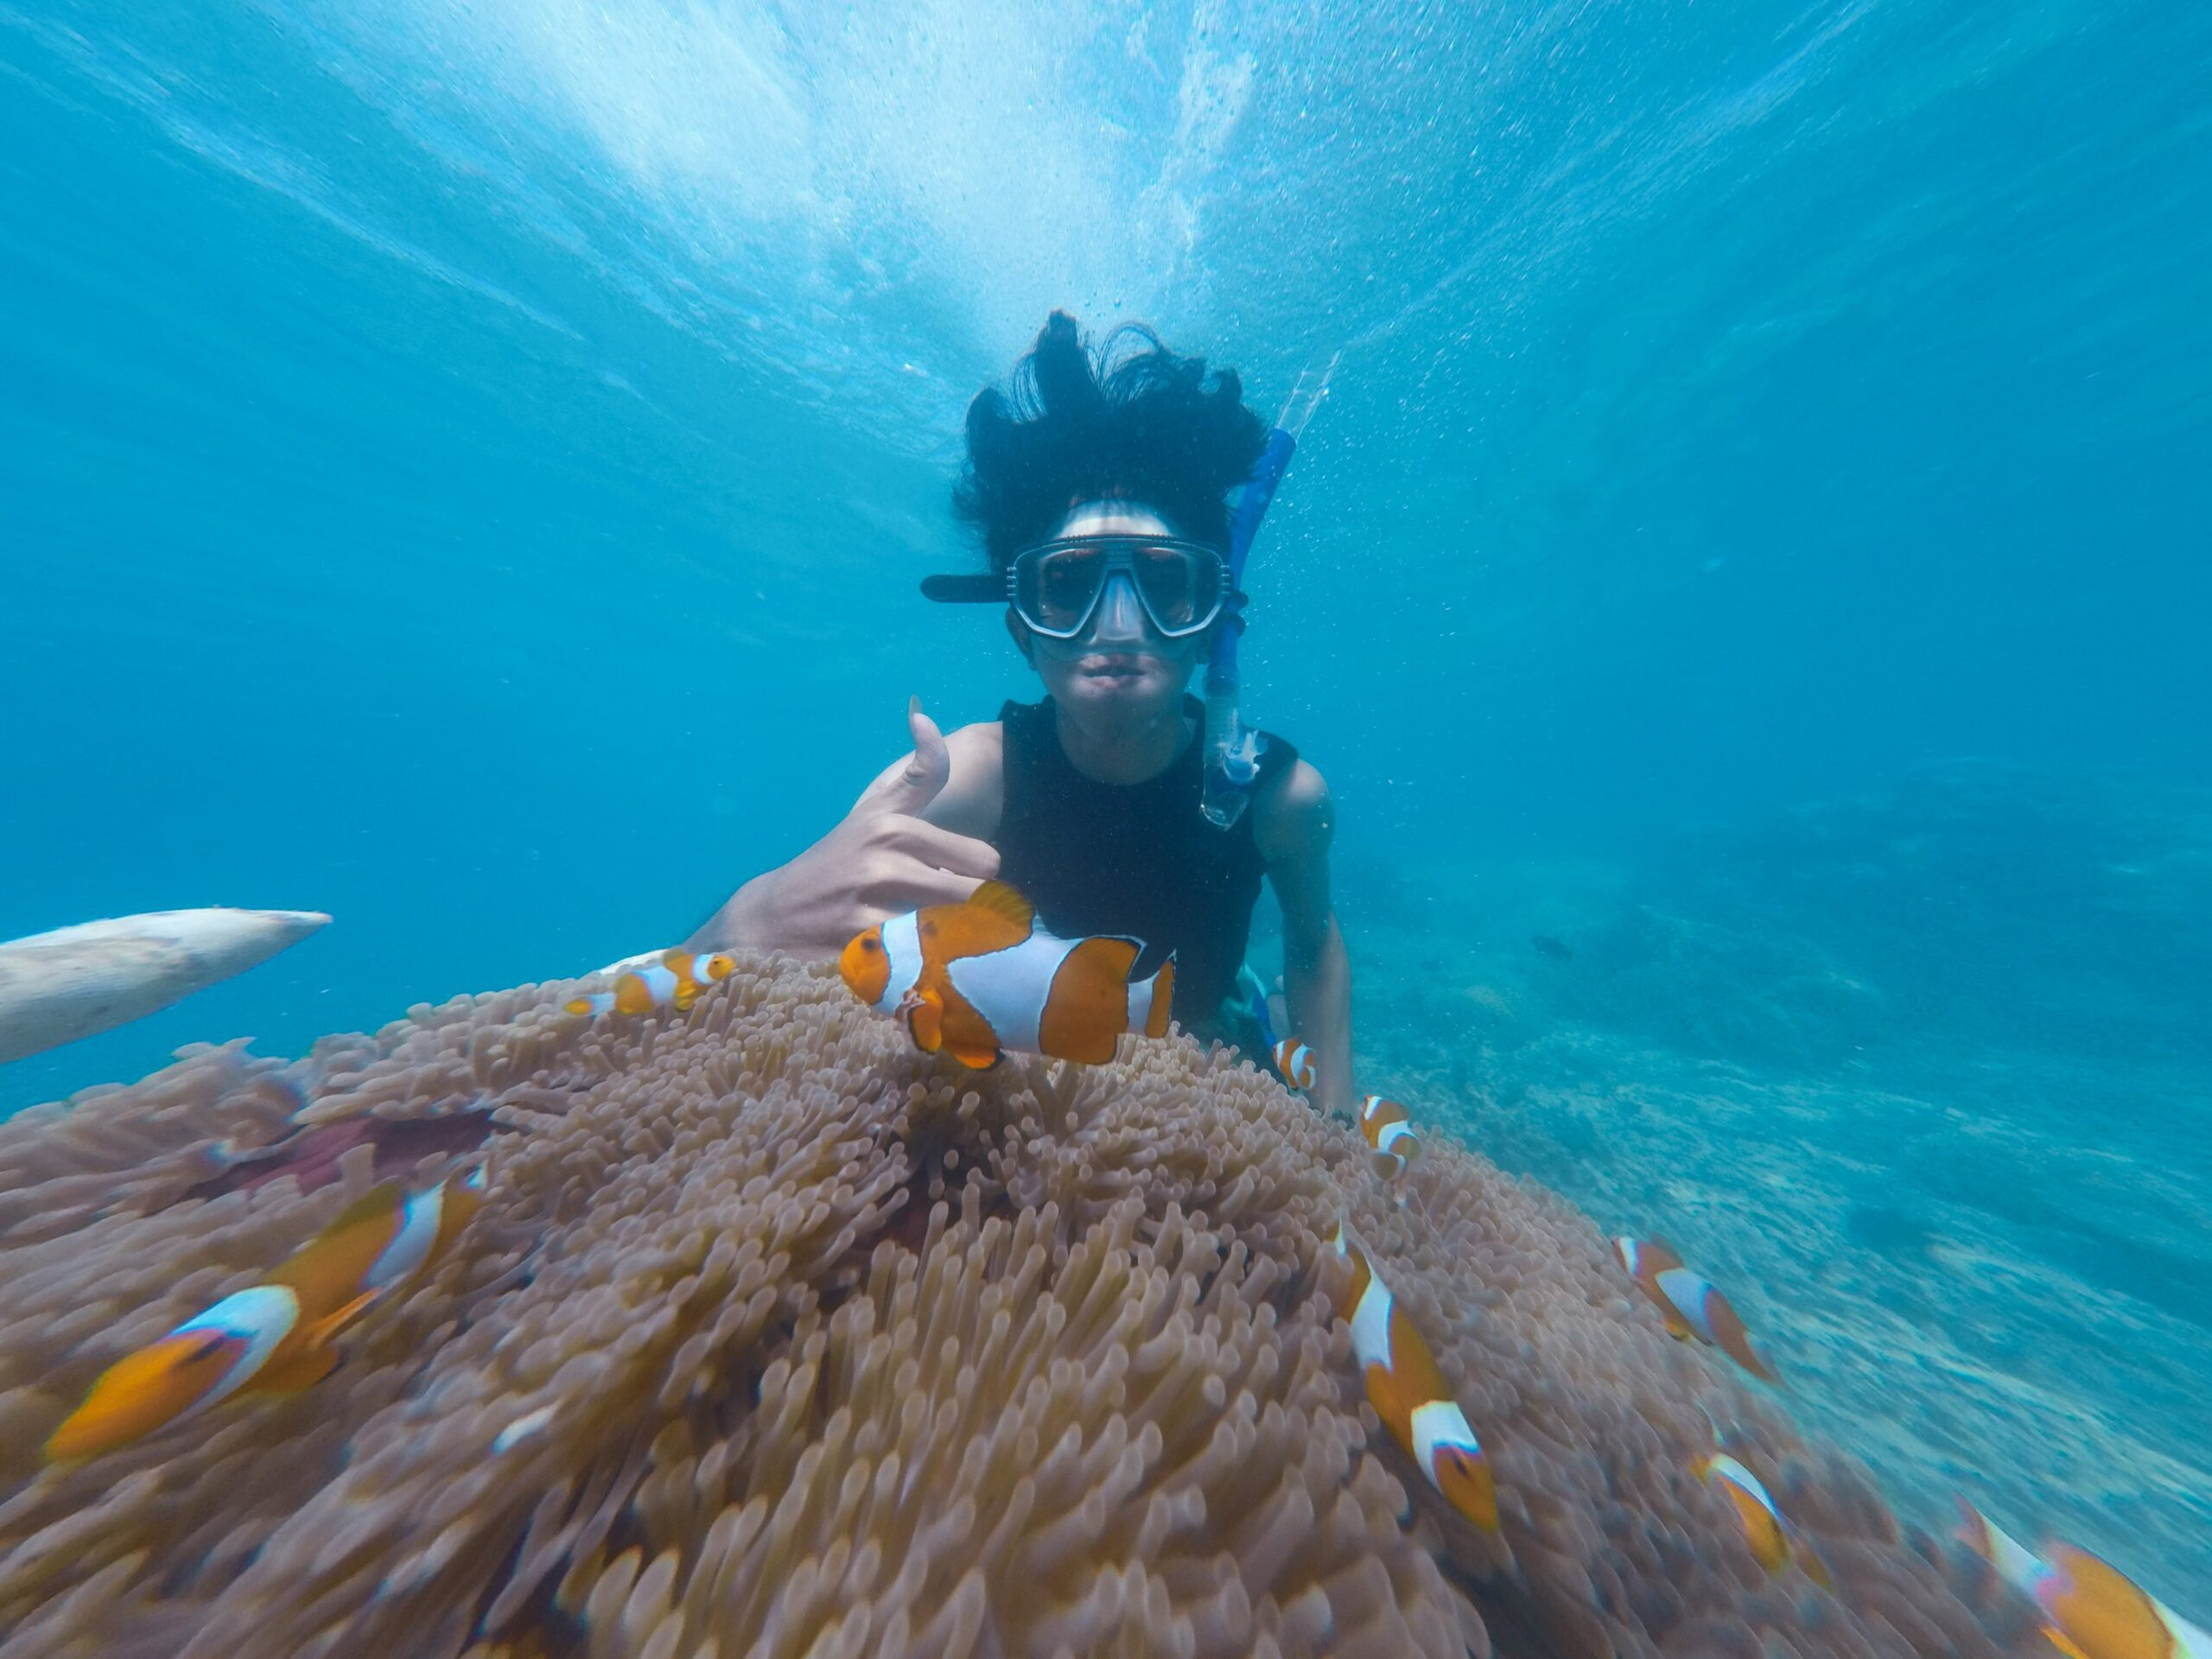 Snorkeling with Nemo fish